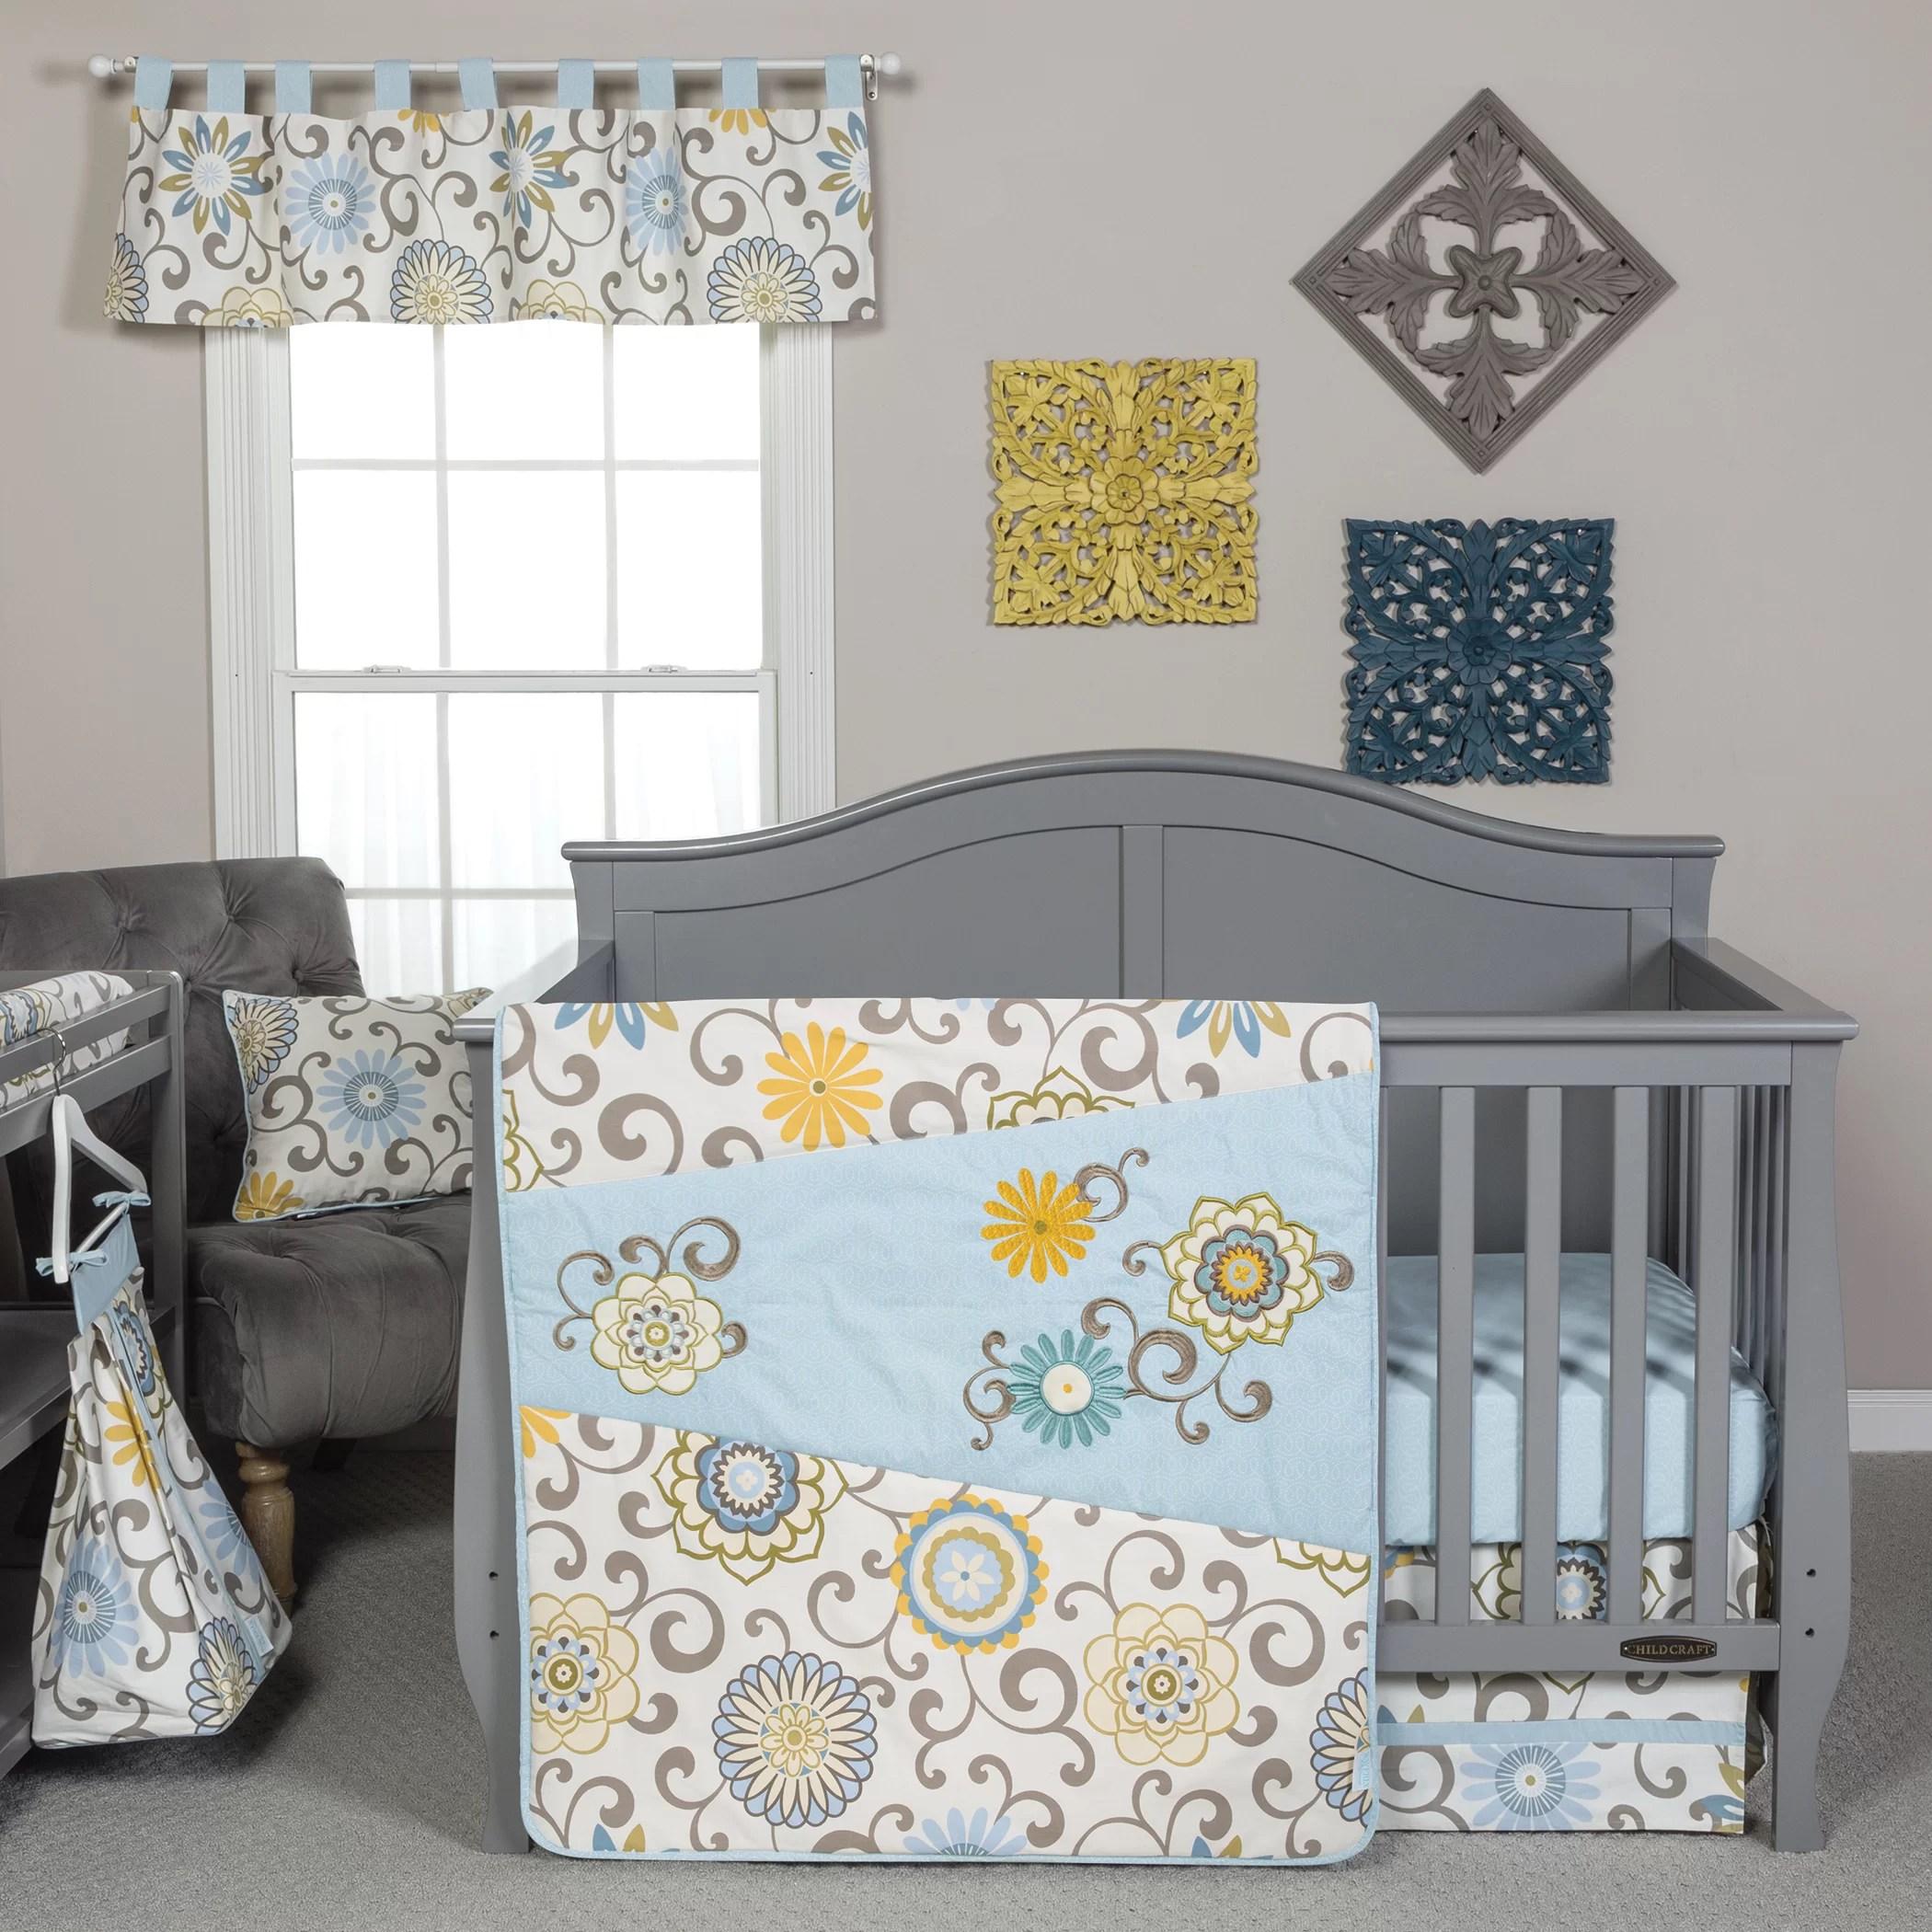 isabelle max mattea 4 piece crib bedding set reviews wayfair